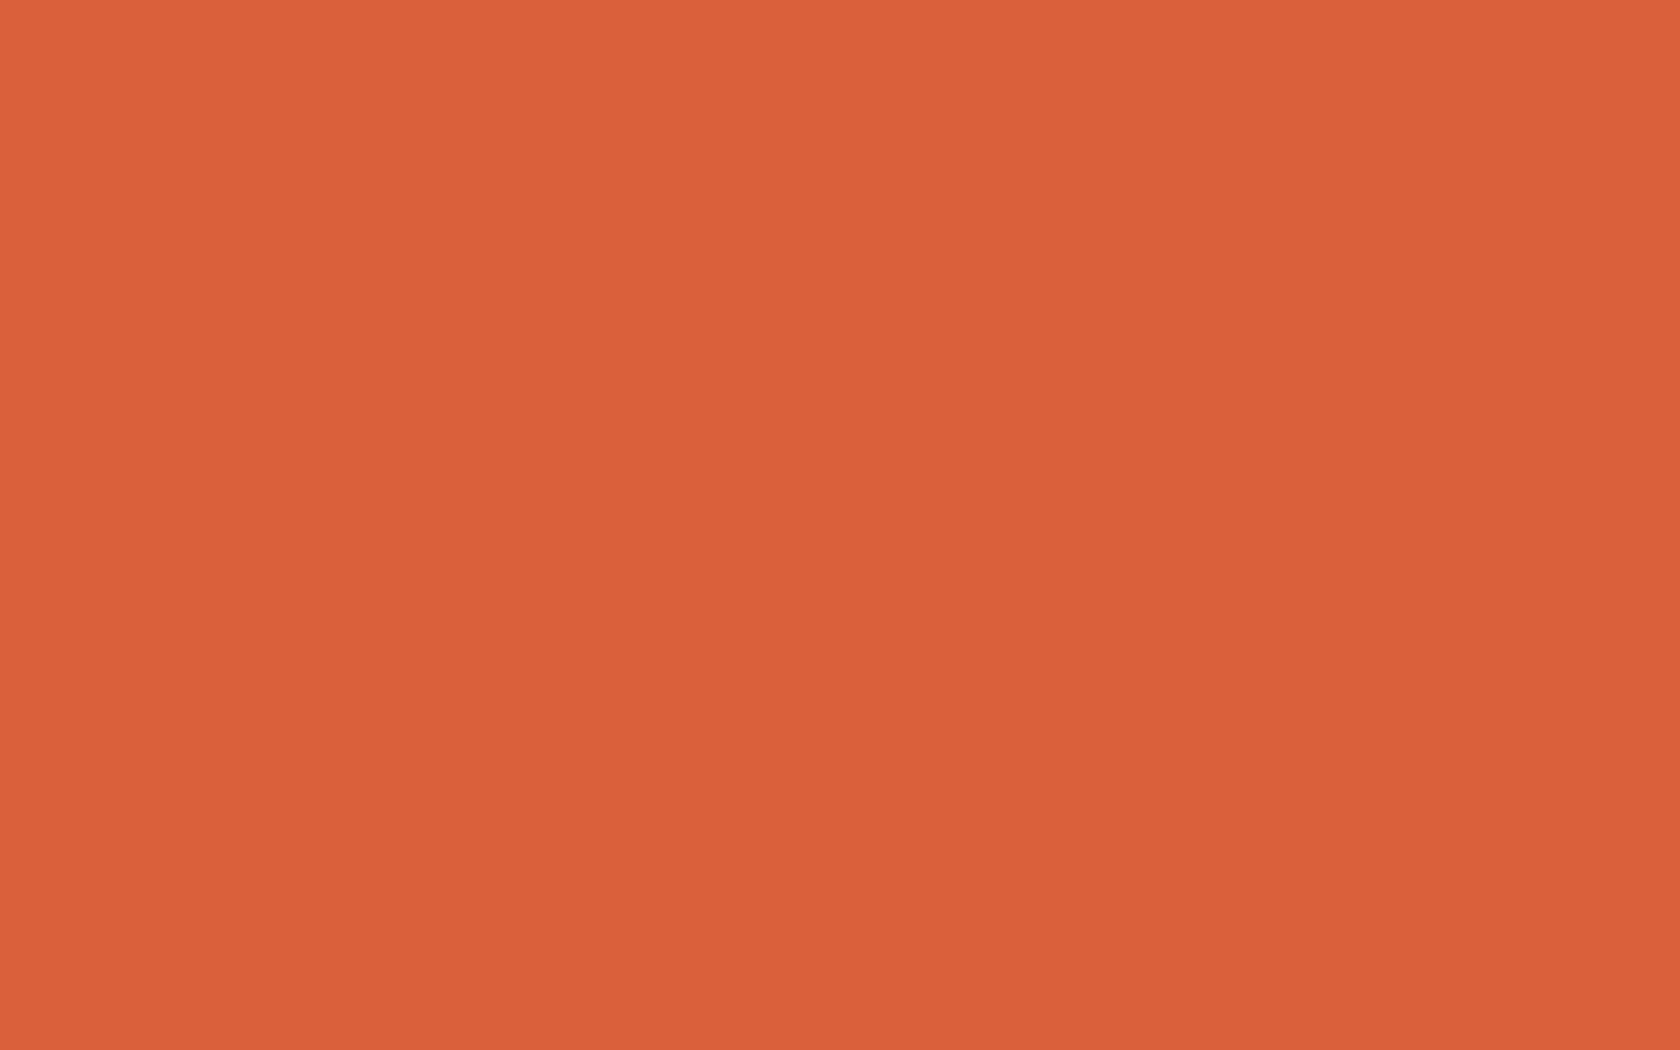 1680x1050 Medium Vermilion Solid Color Background